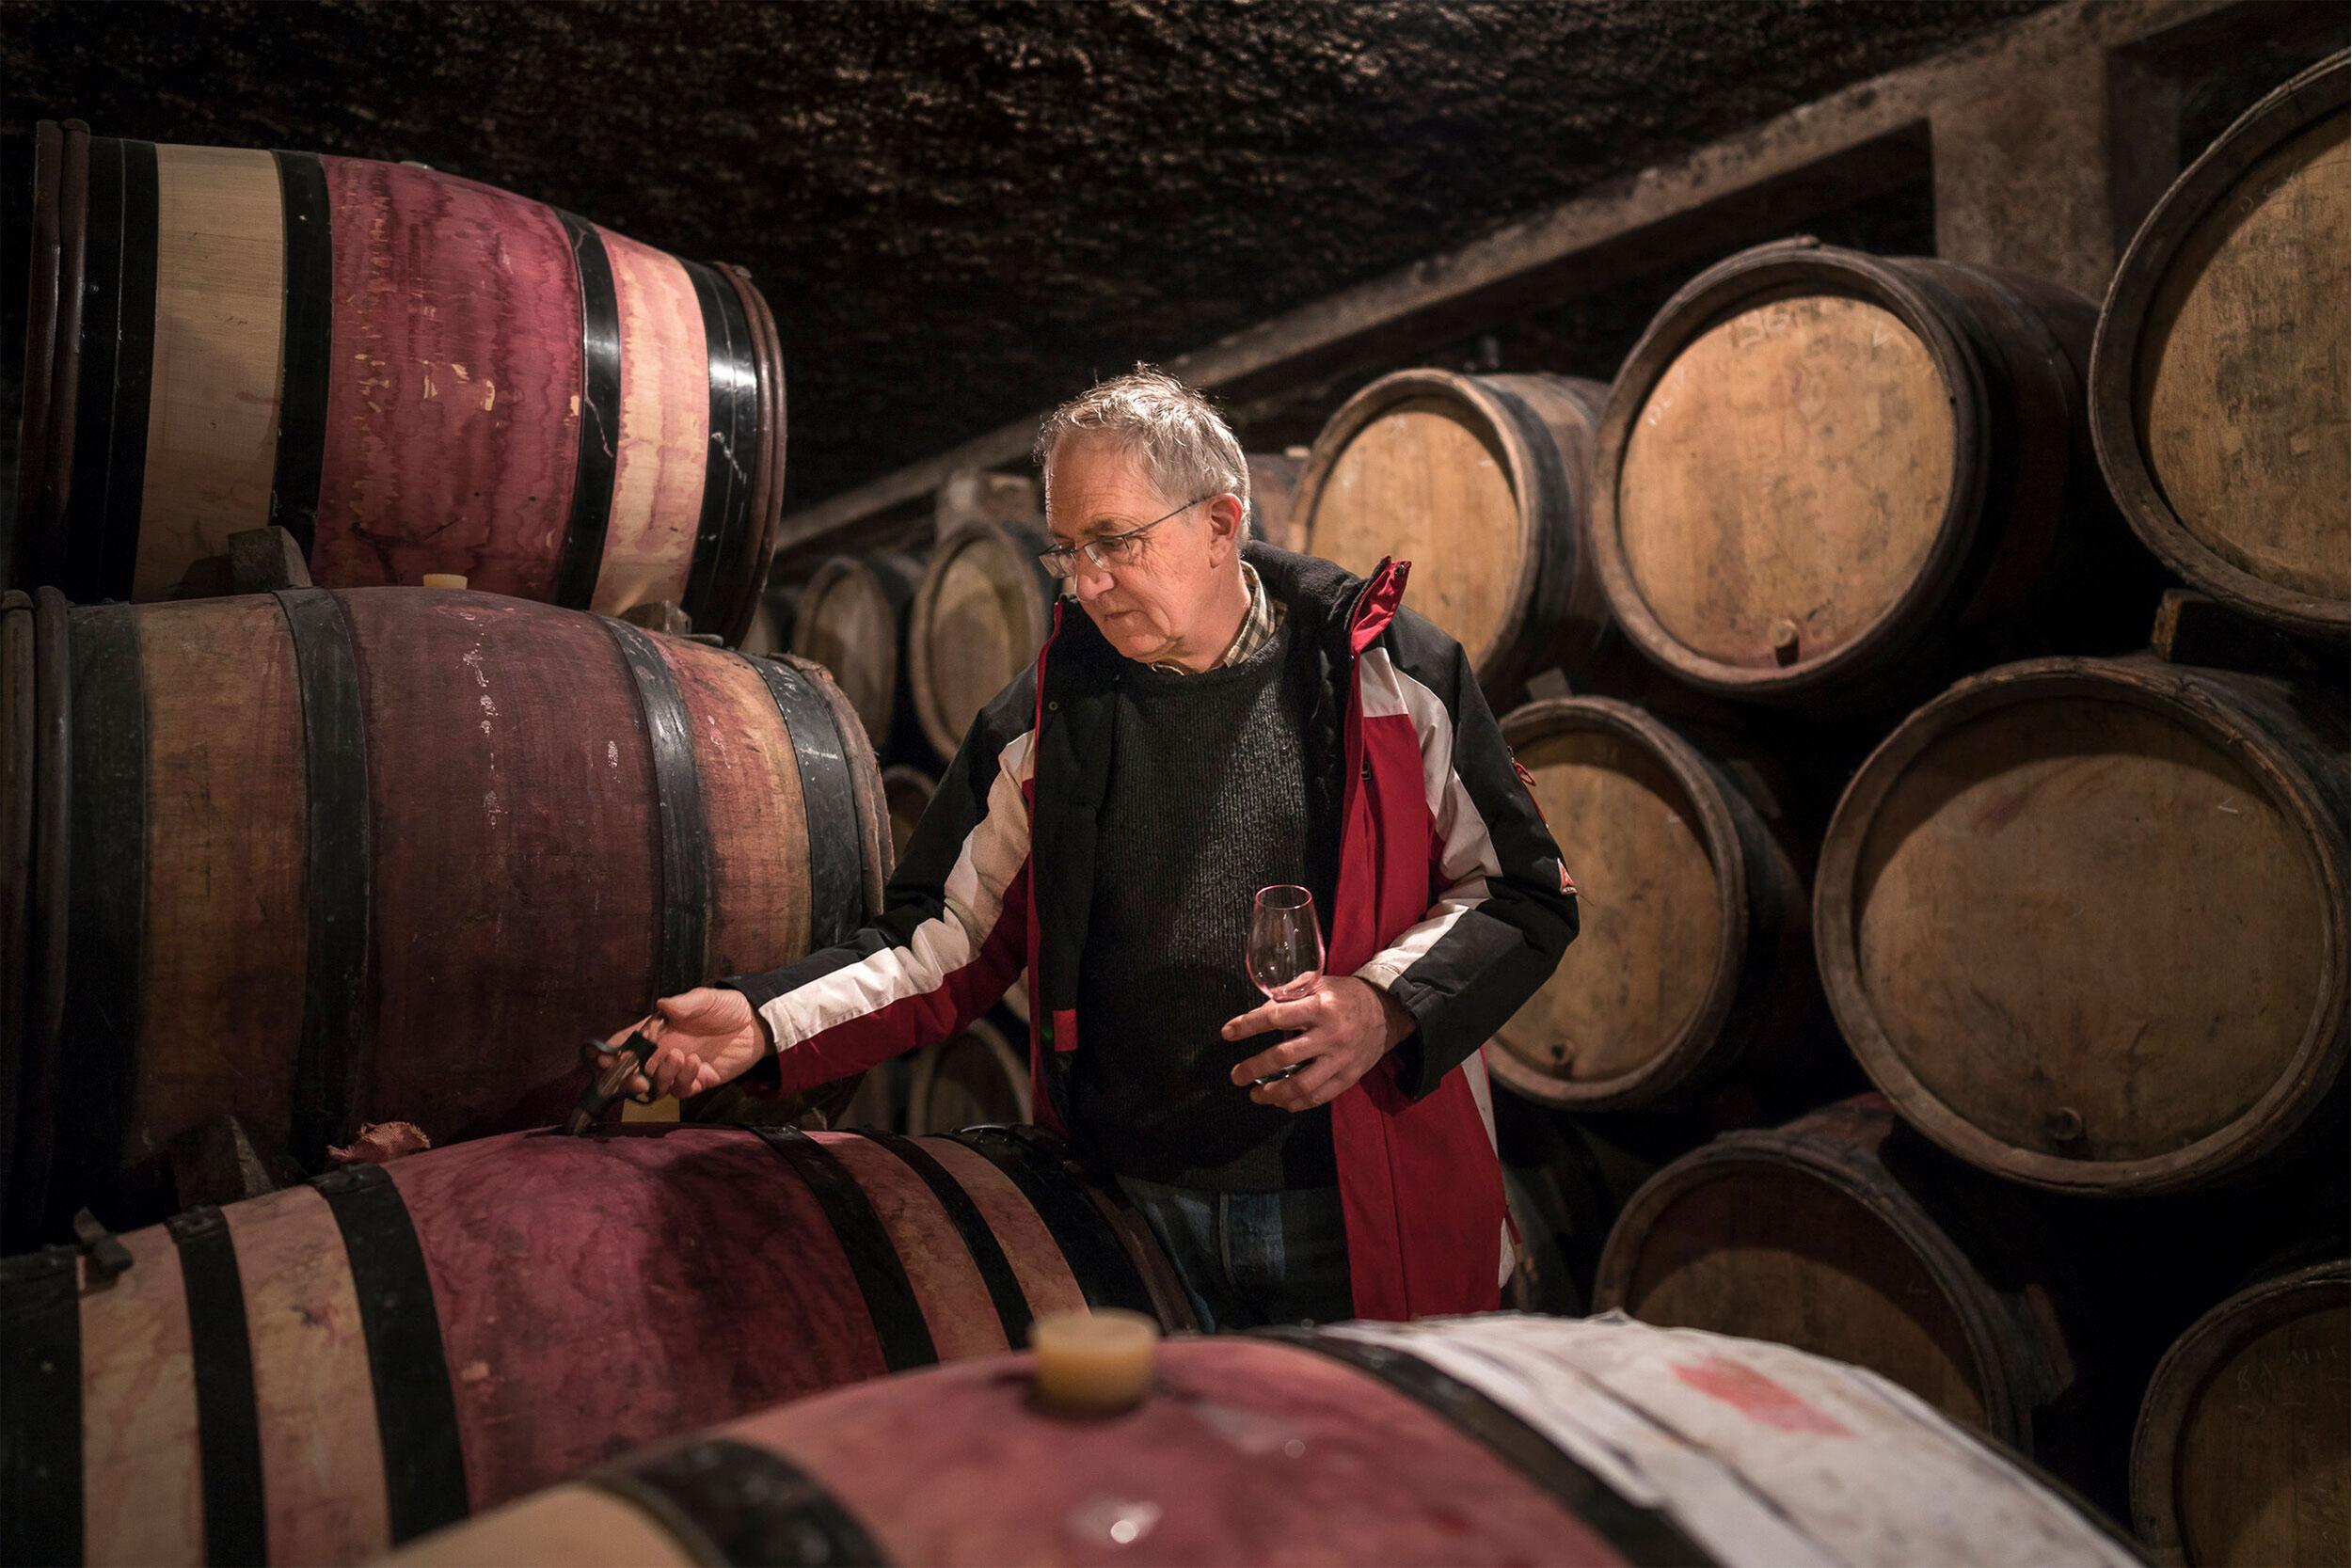 Winemaker in cellar with barrels